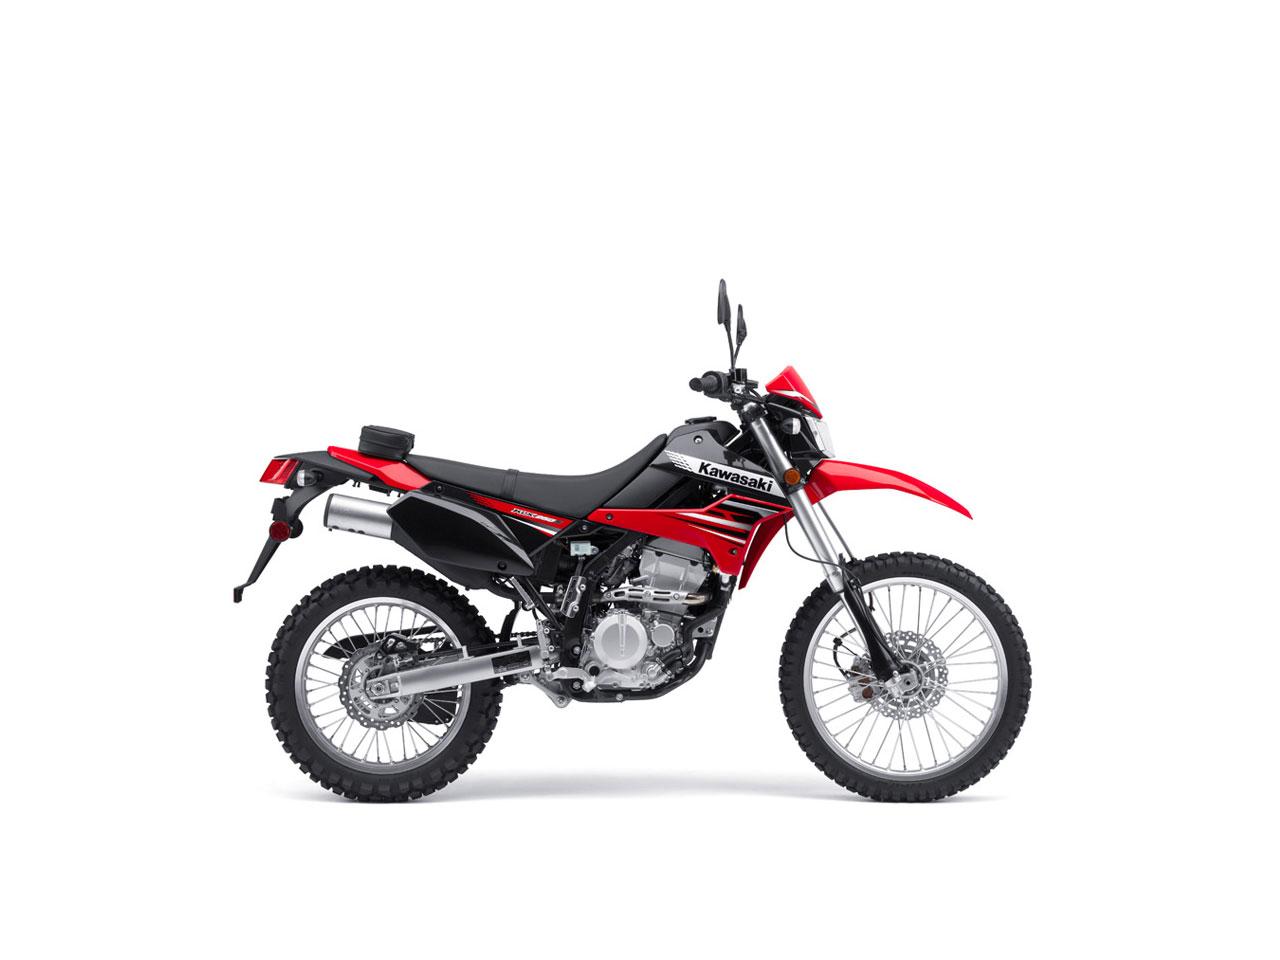 Kawasaki Klx250s Specs